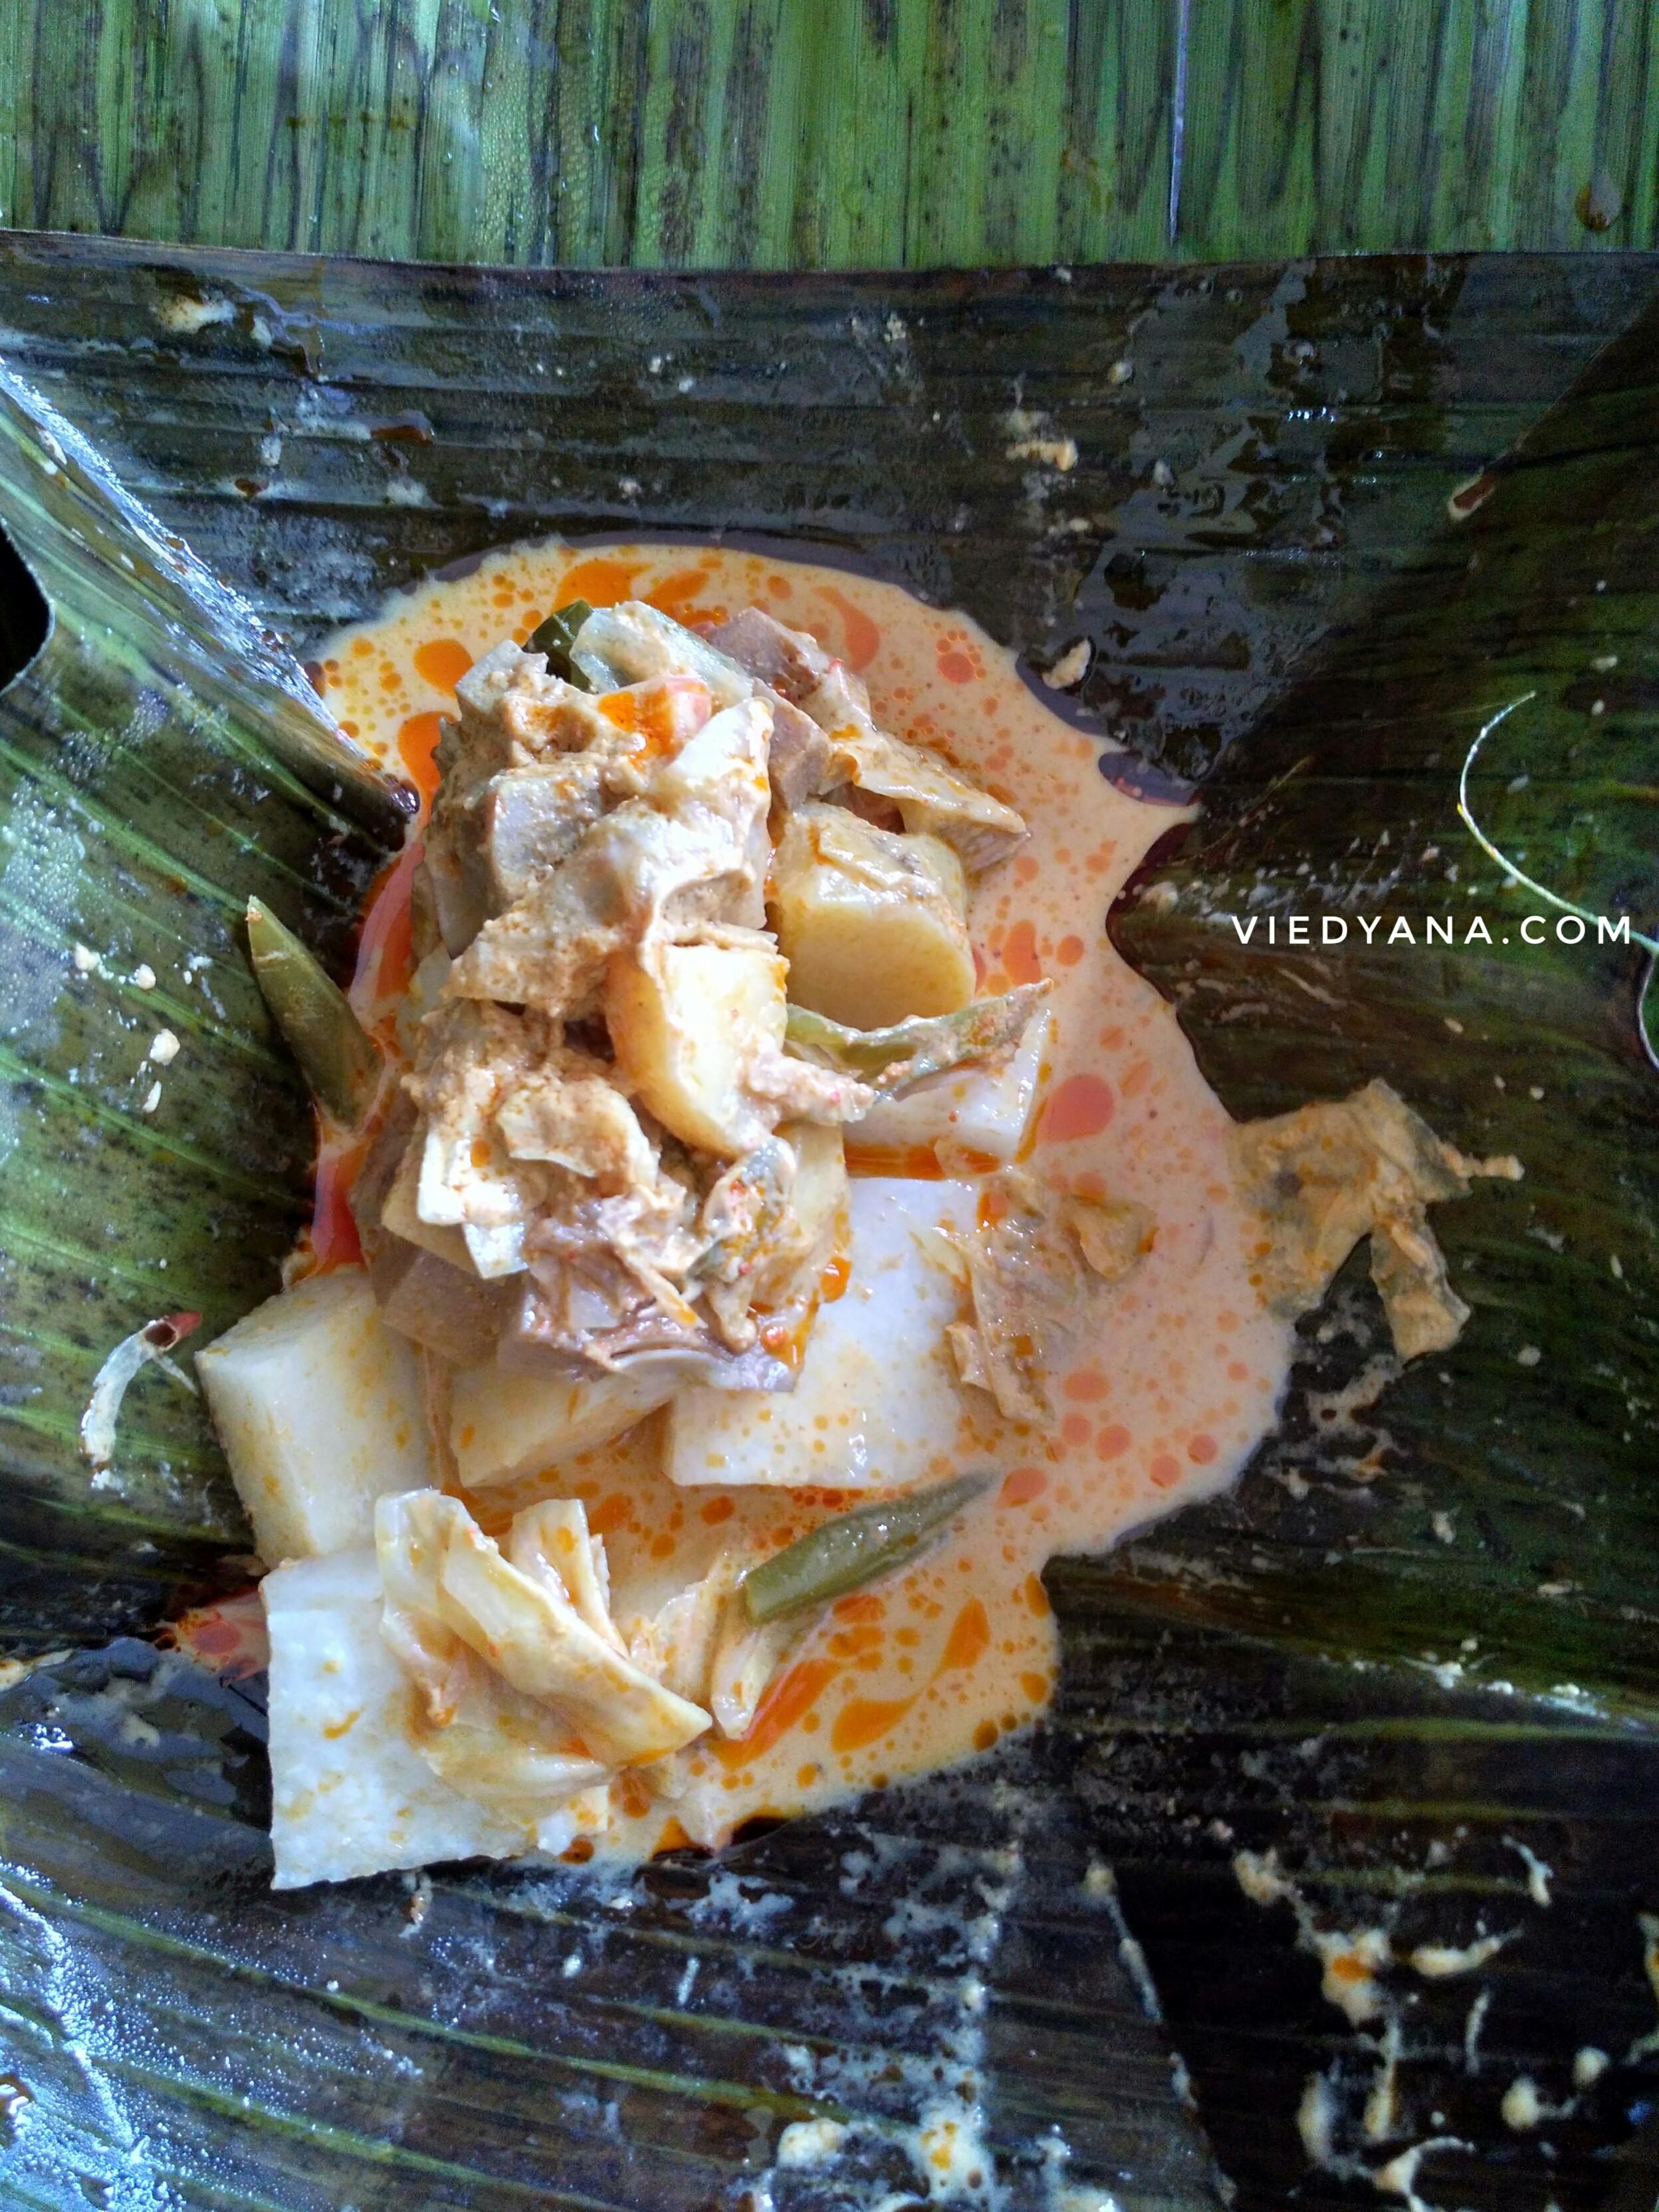 RoadTripMbokJastra#6: MUST TRY Menjajal Kuliner Khas Ranah  Minang Part 1